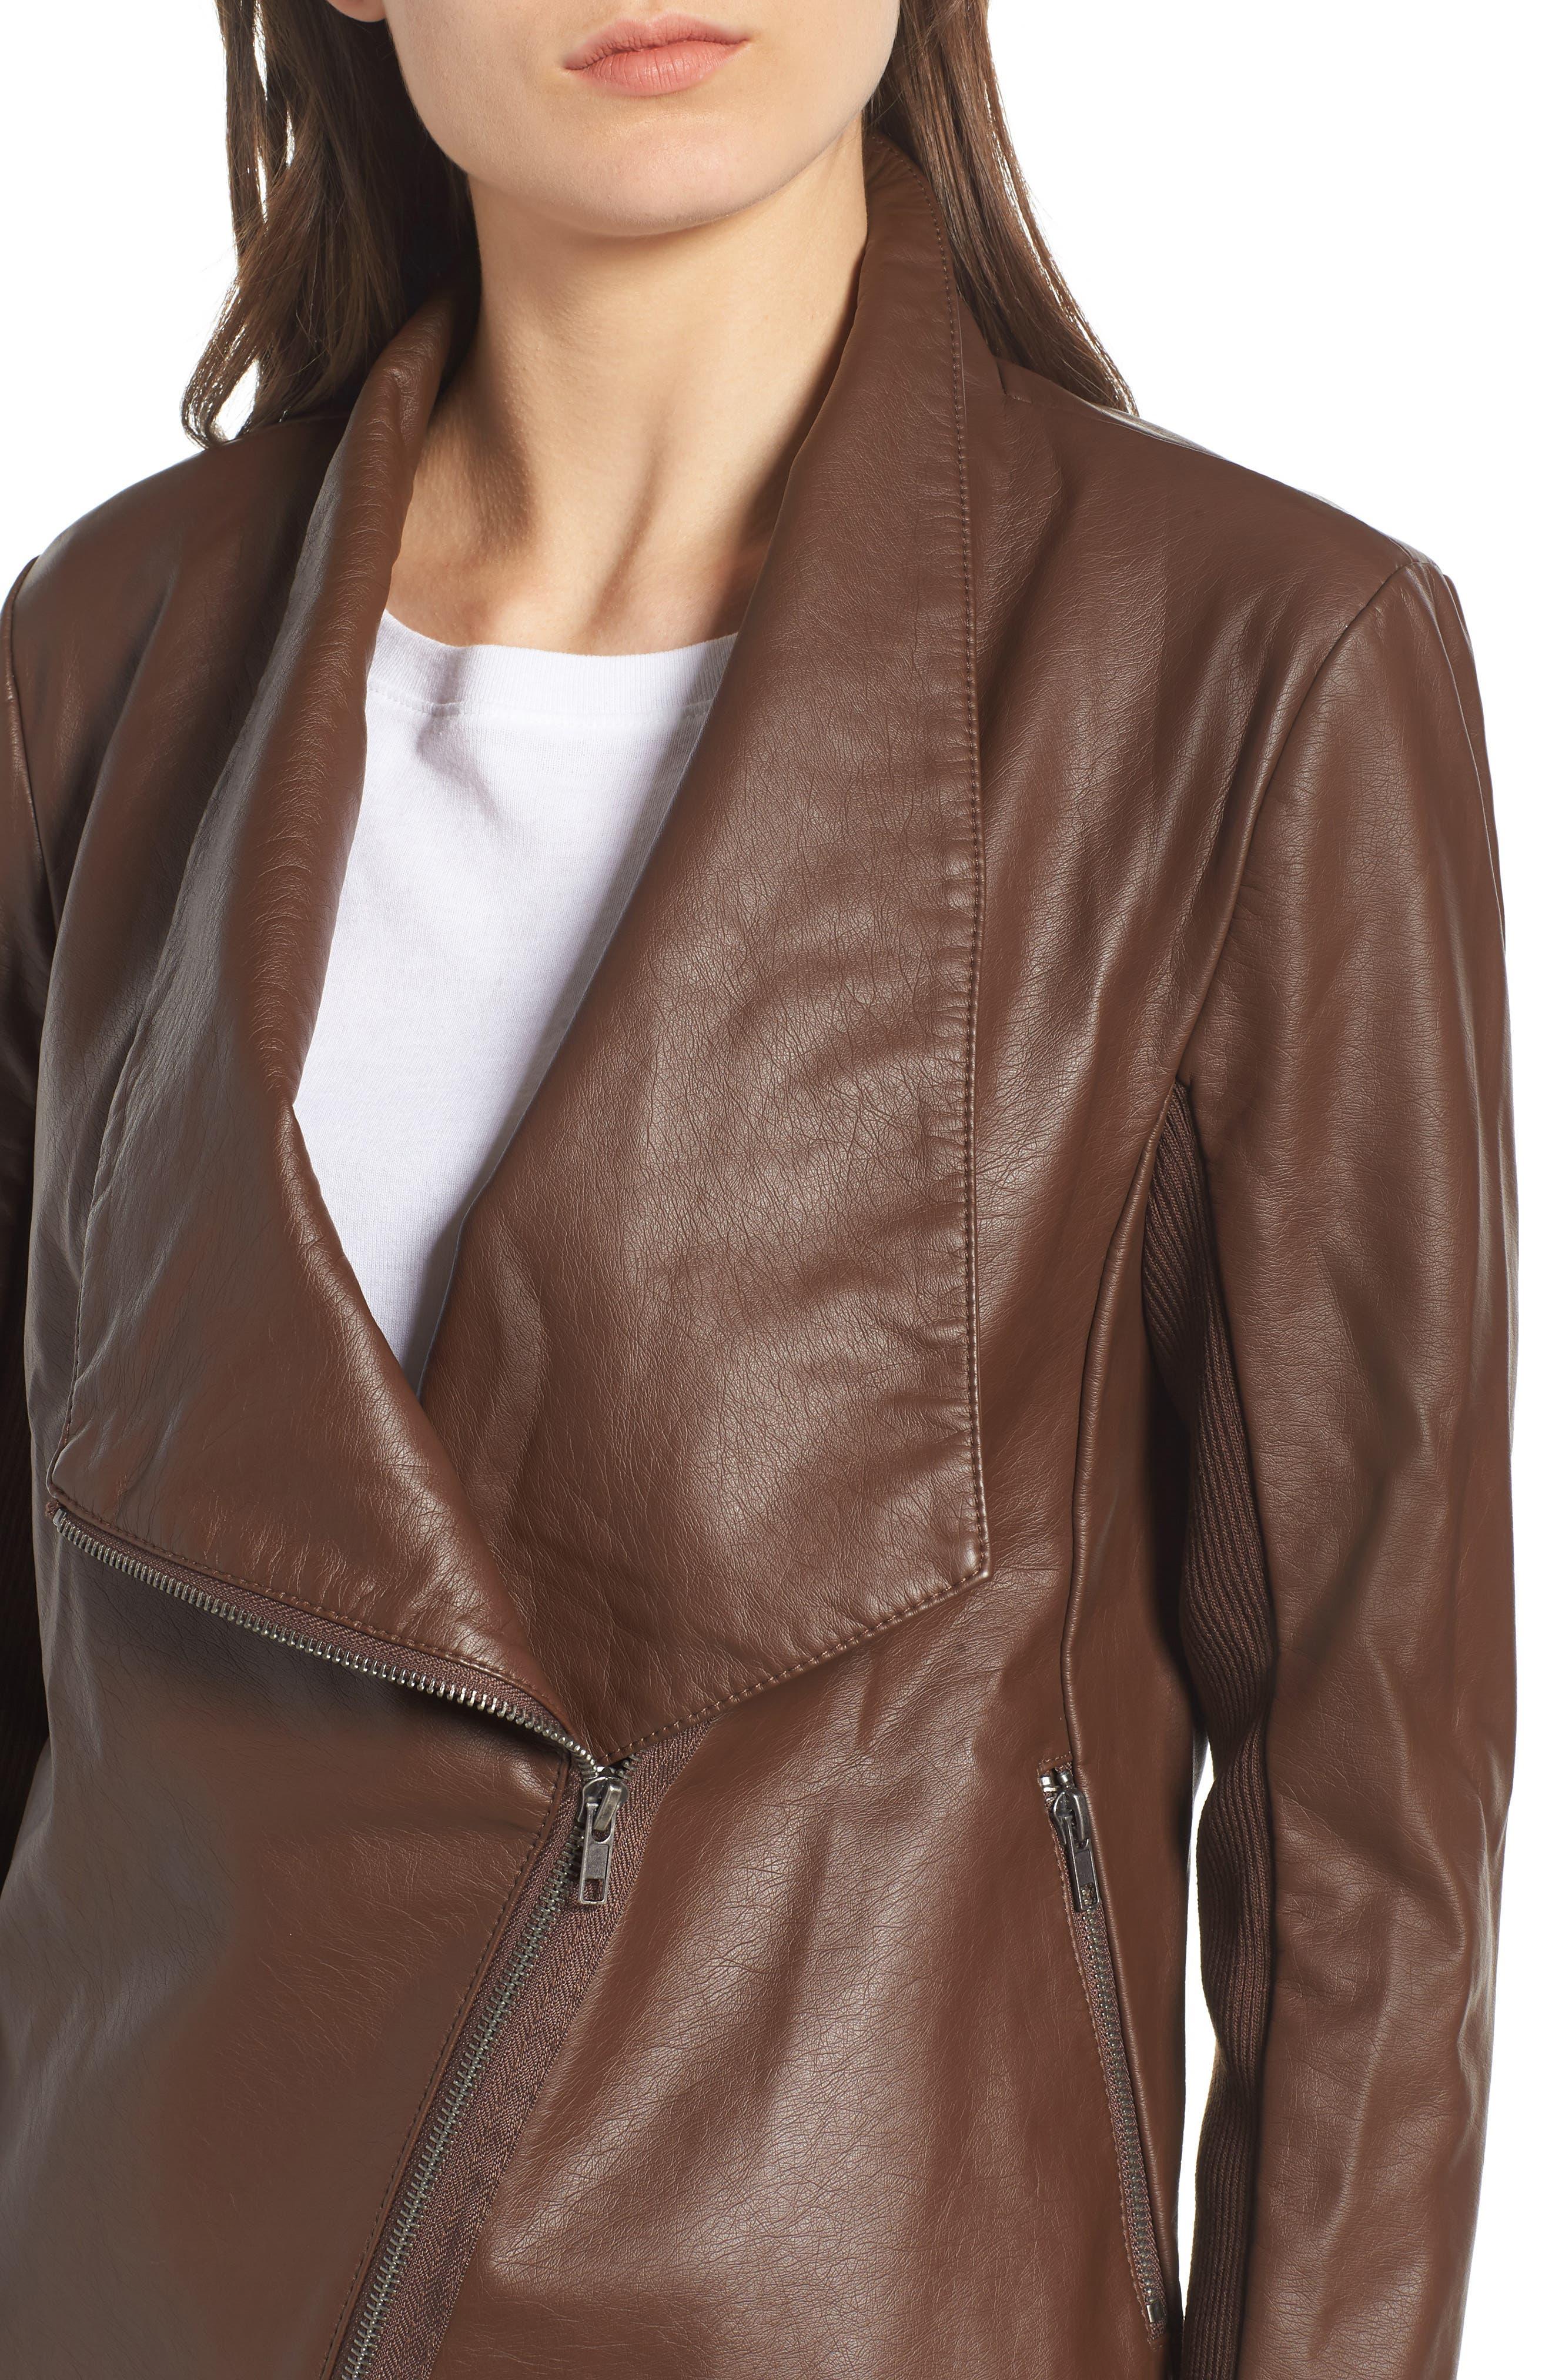 Gabrielle Faux Leather Asymmetrical Jacket,                             Alternate thumbnail 4, color,                             202